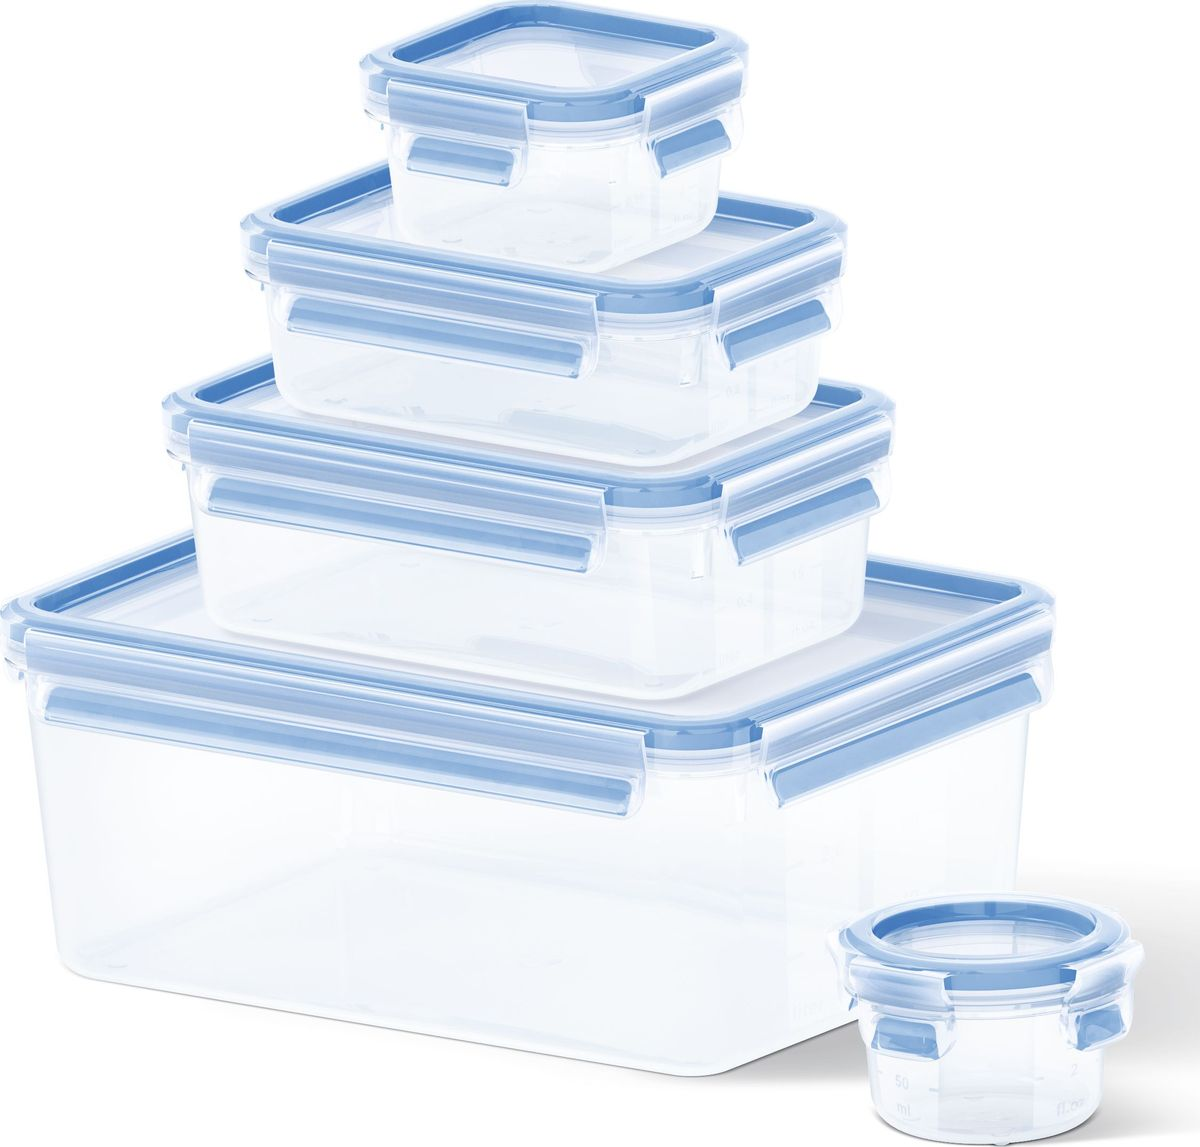 Набор контейнеров Emsa Clip&Close, 5 шт сушилка для салата emsa basic 4 л